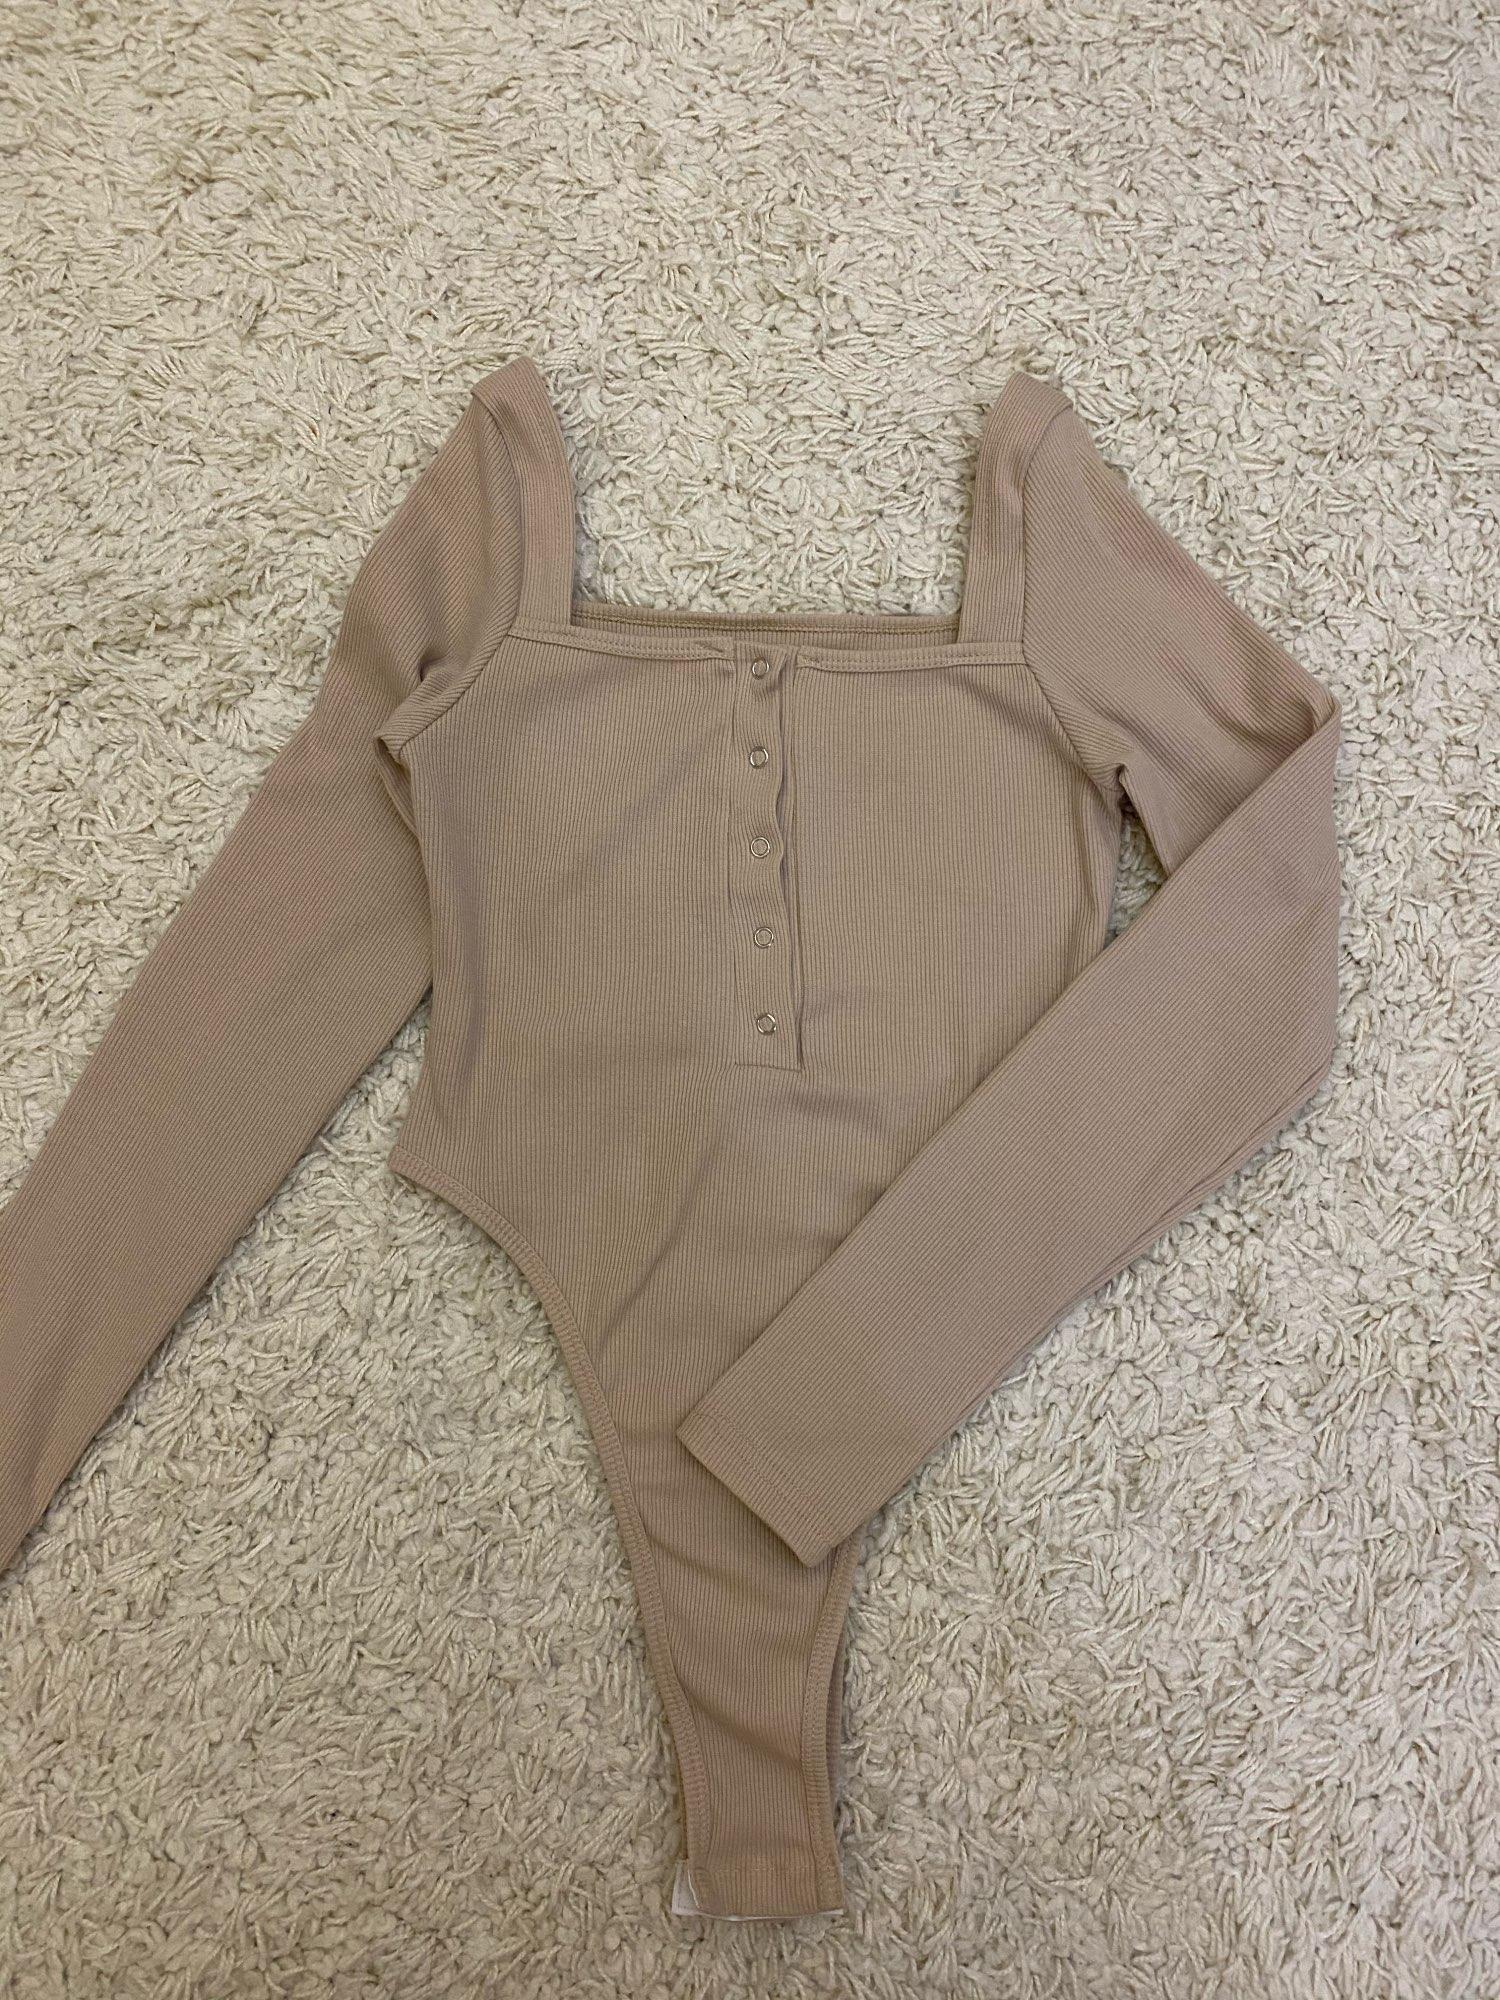 Black Off Shoulder Sexy Bodysuit Women Long Sleeve Slash Buttons Bodycon Rompers Womens Jumpsuit Solid Summer Body Suit|Bodysuits|   - AliExpress